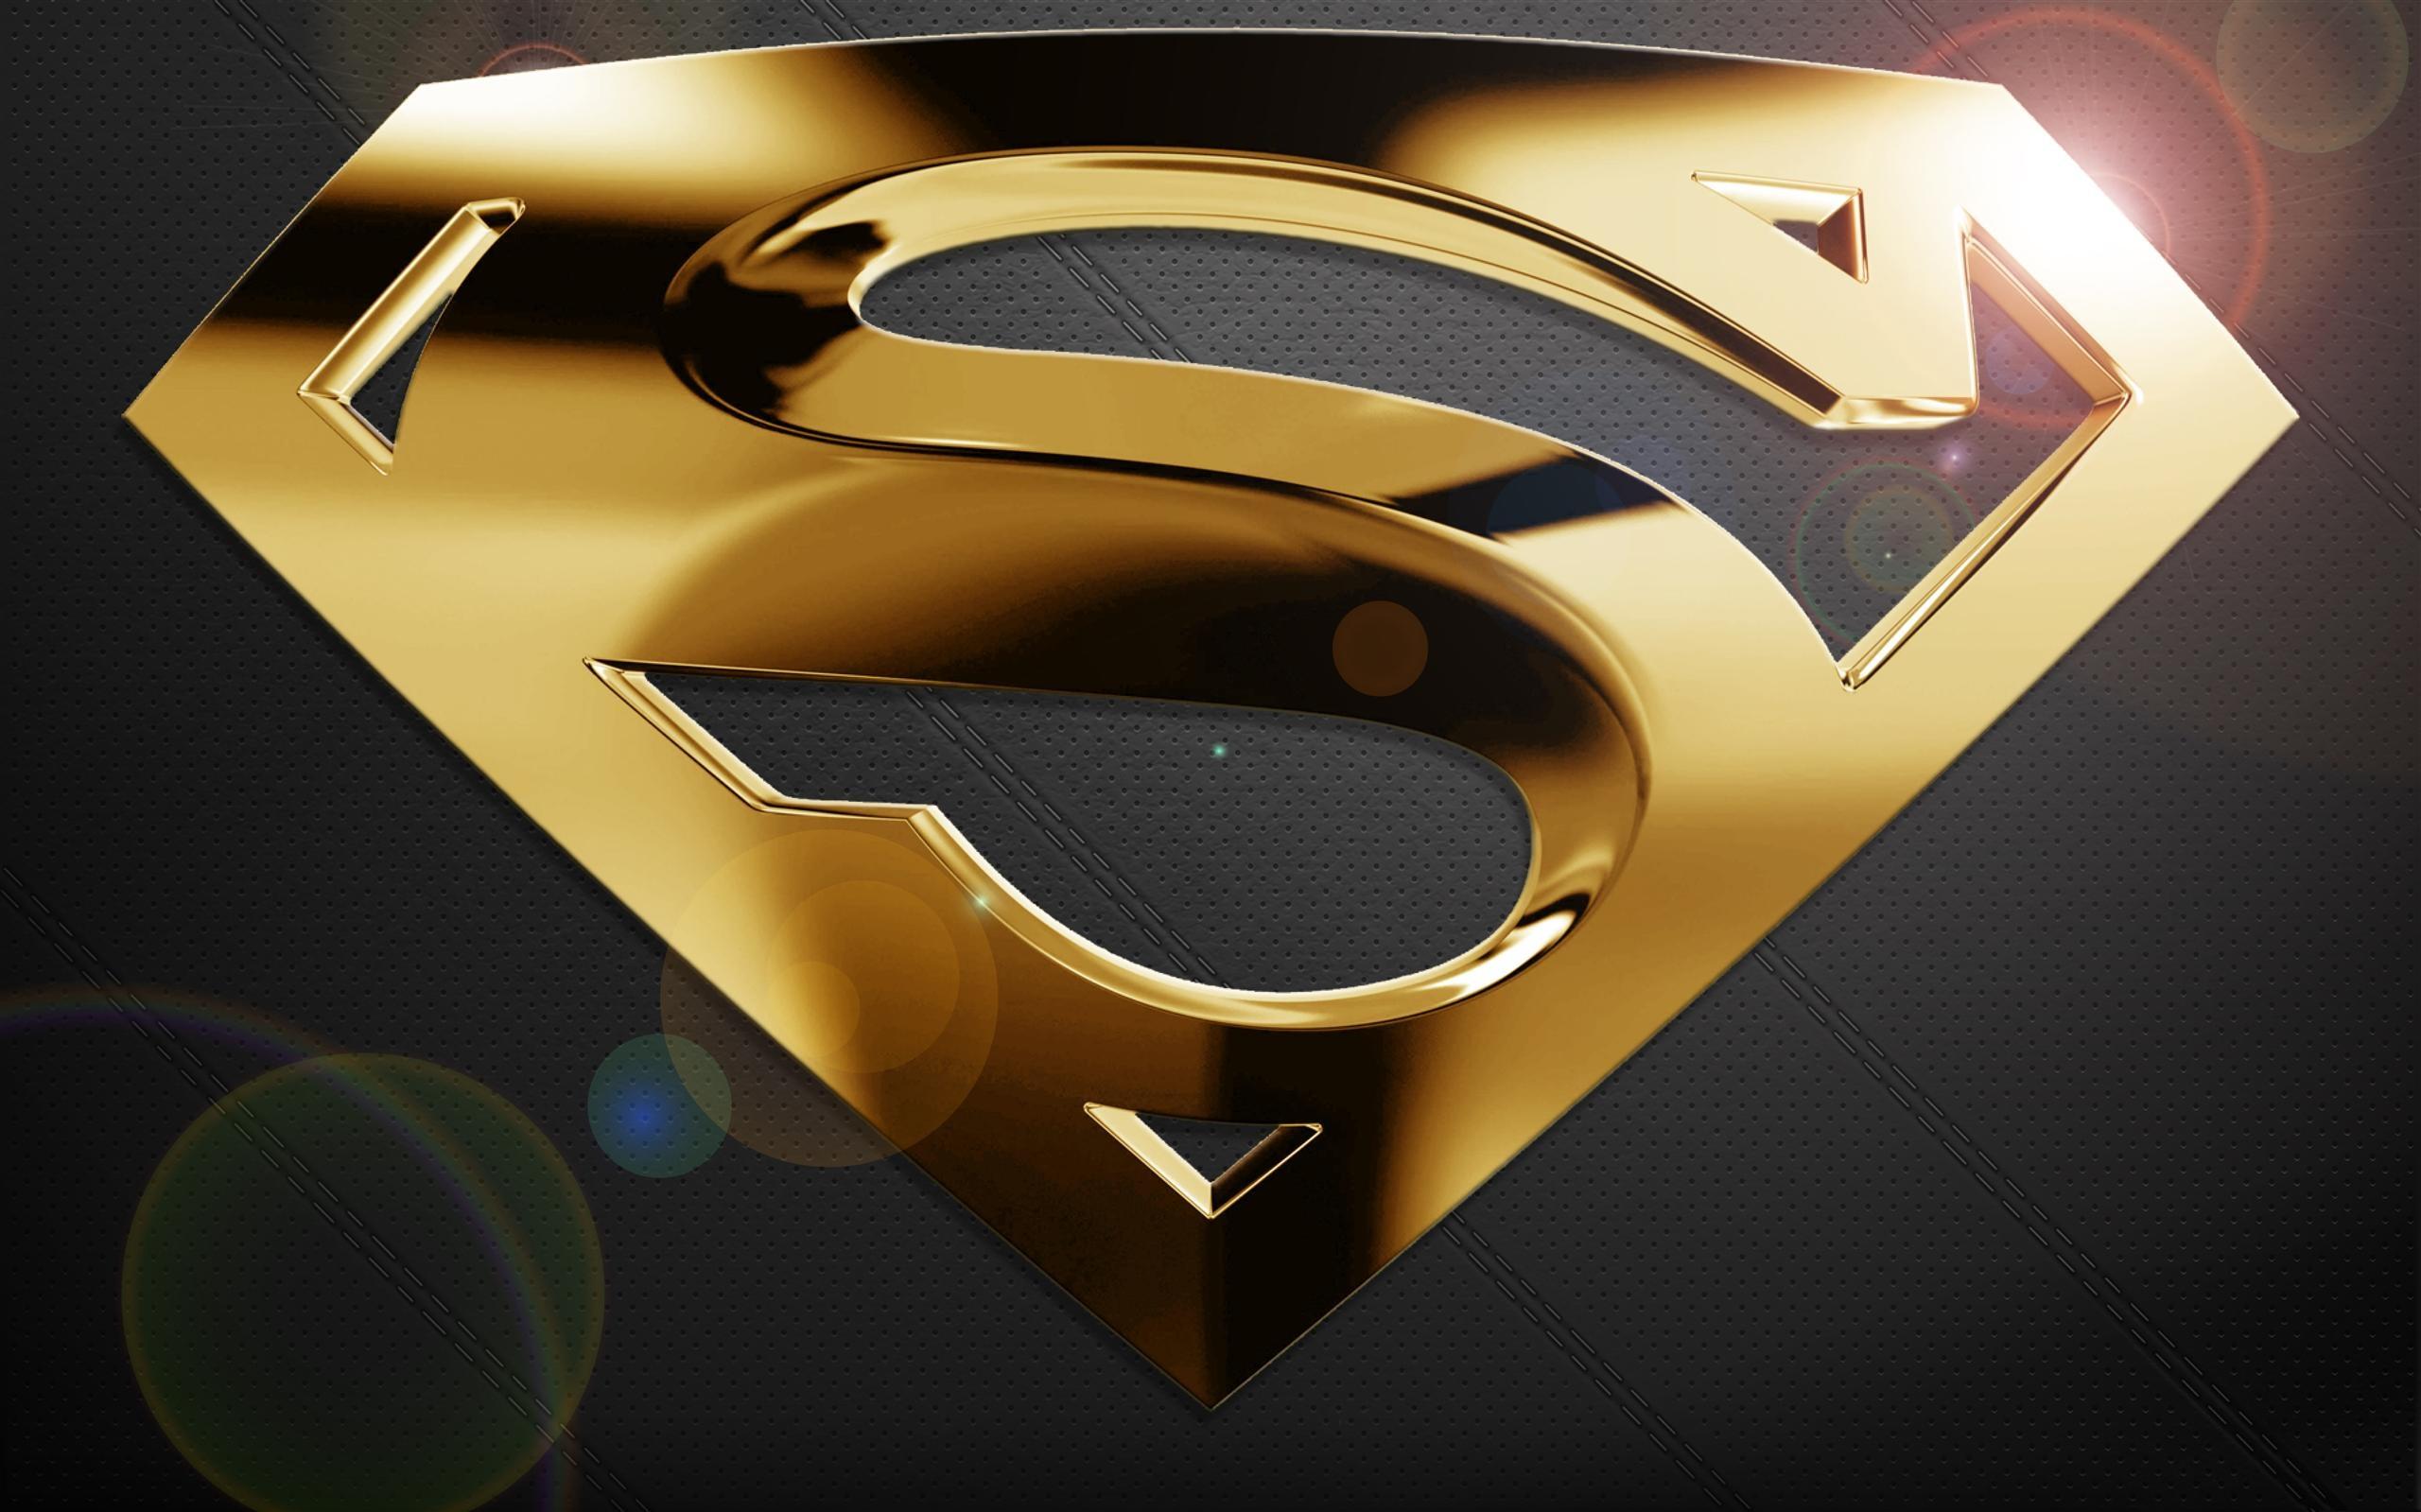 Graffiti Wallpaper Hd Logo Superman Wallpaper Hd Free Download Pixelstalk Net